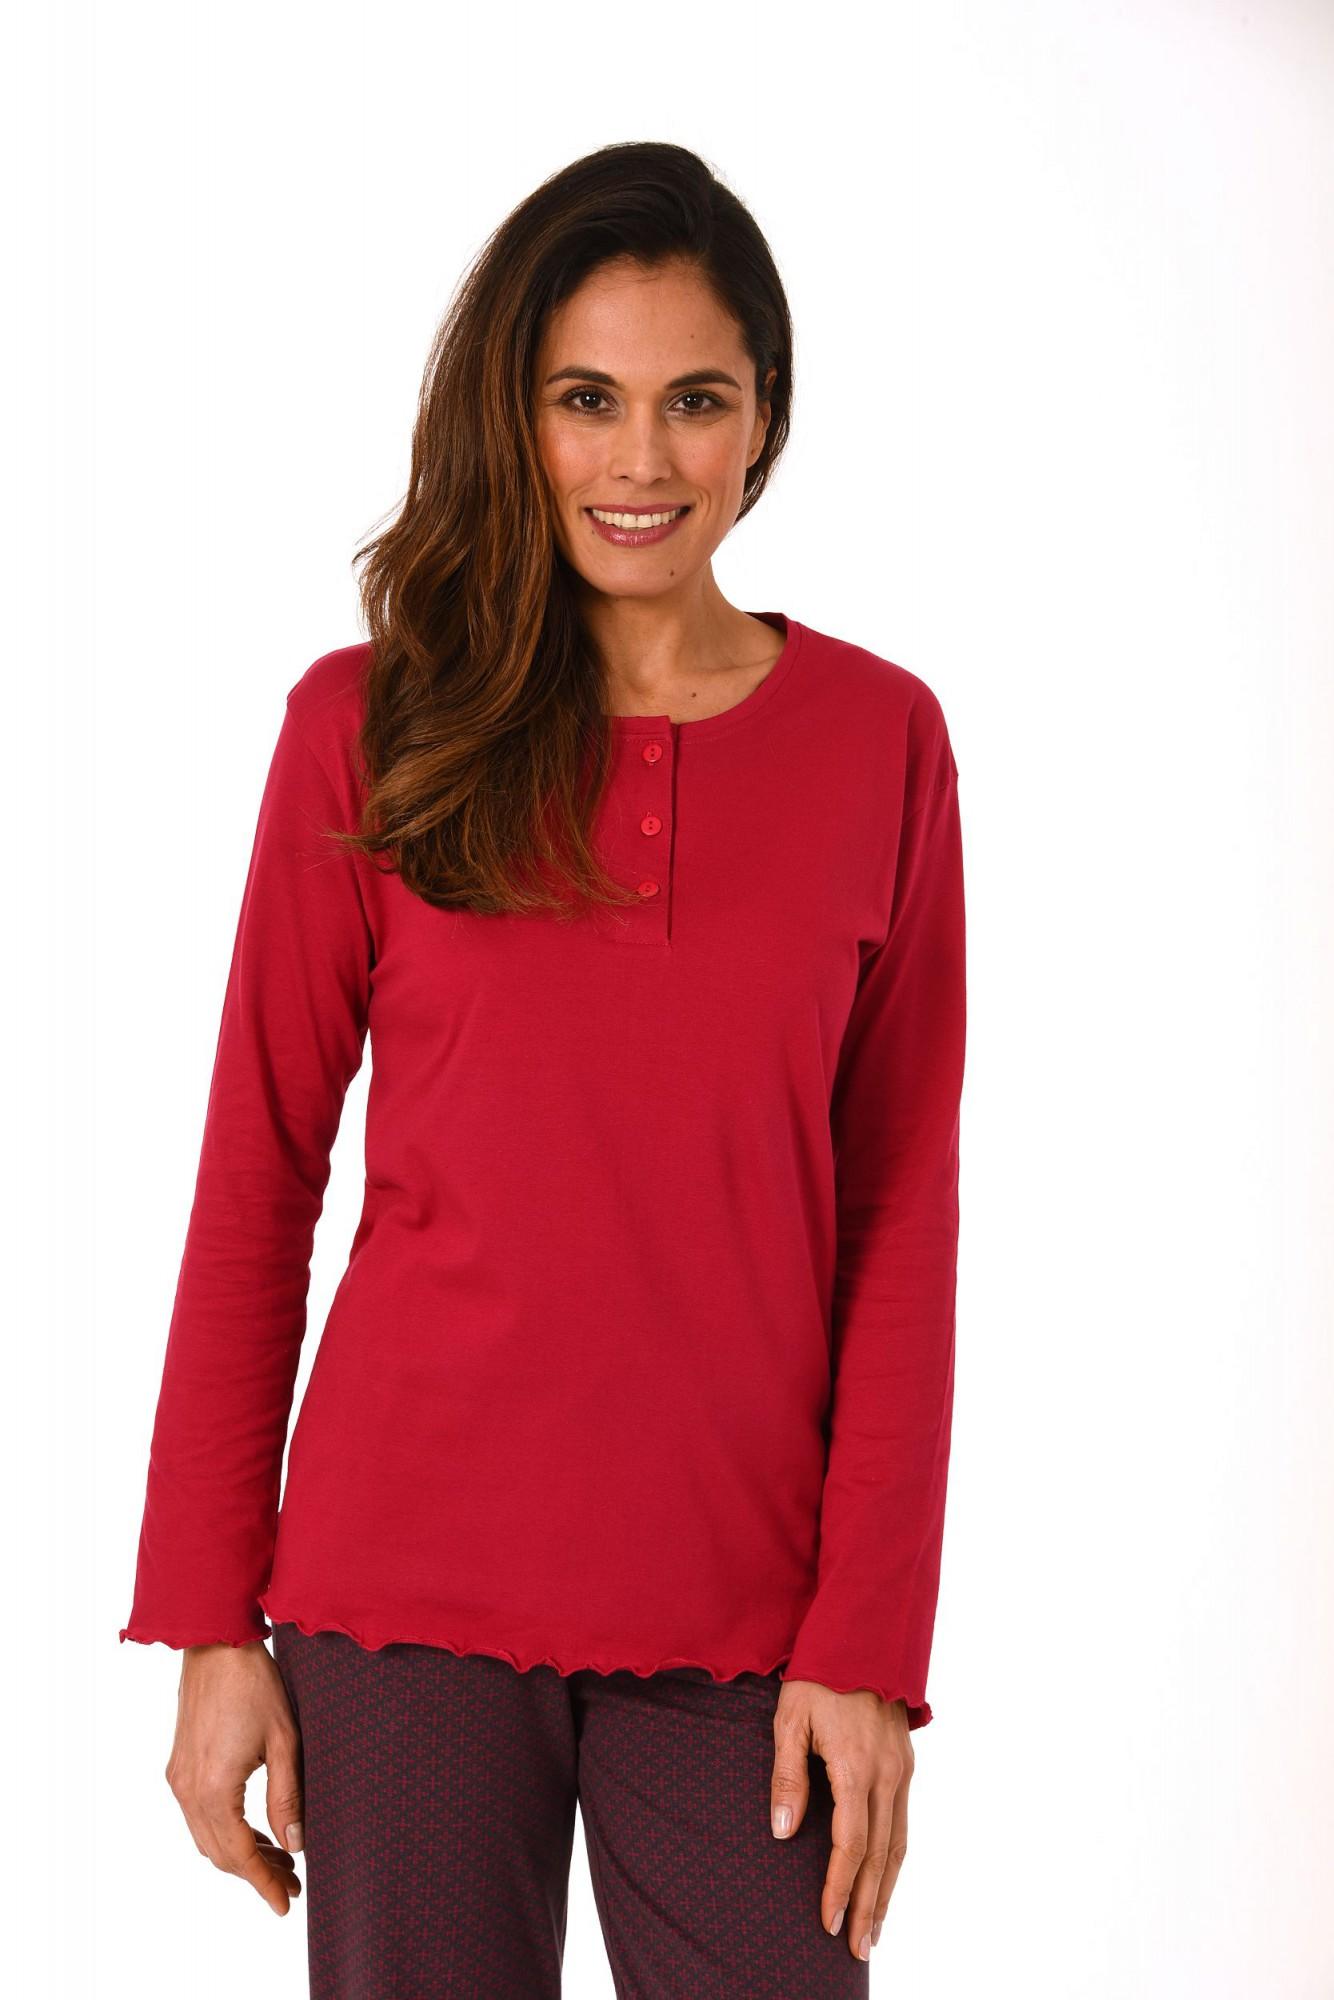 Damen Shirt - Oberteil langarm Mix & Match blau, grau oder beere – 271 219 90 102 – Bild 1